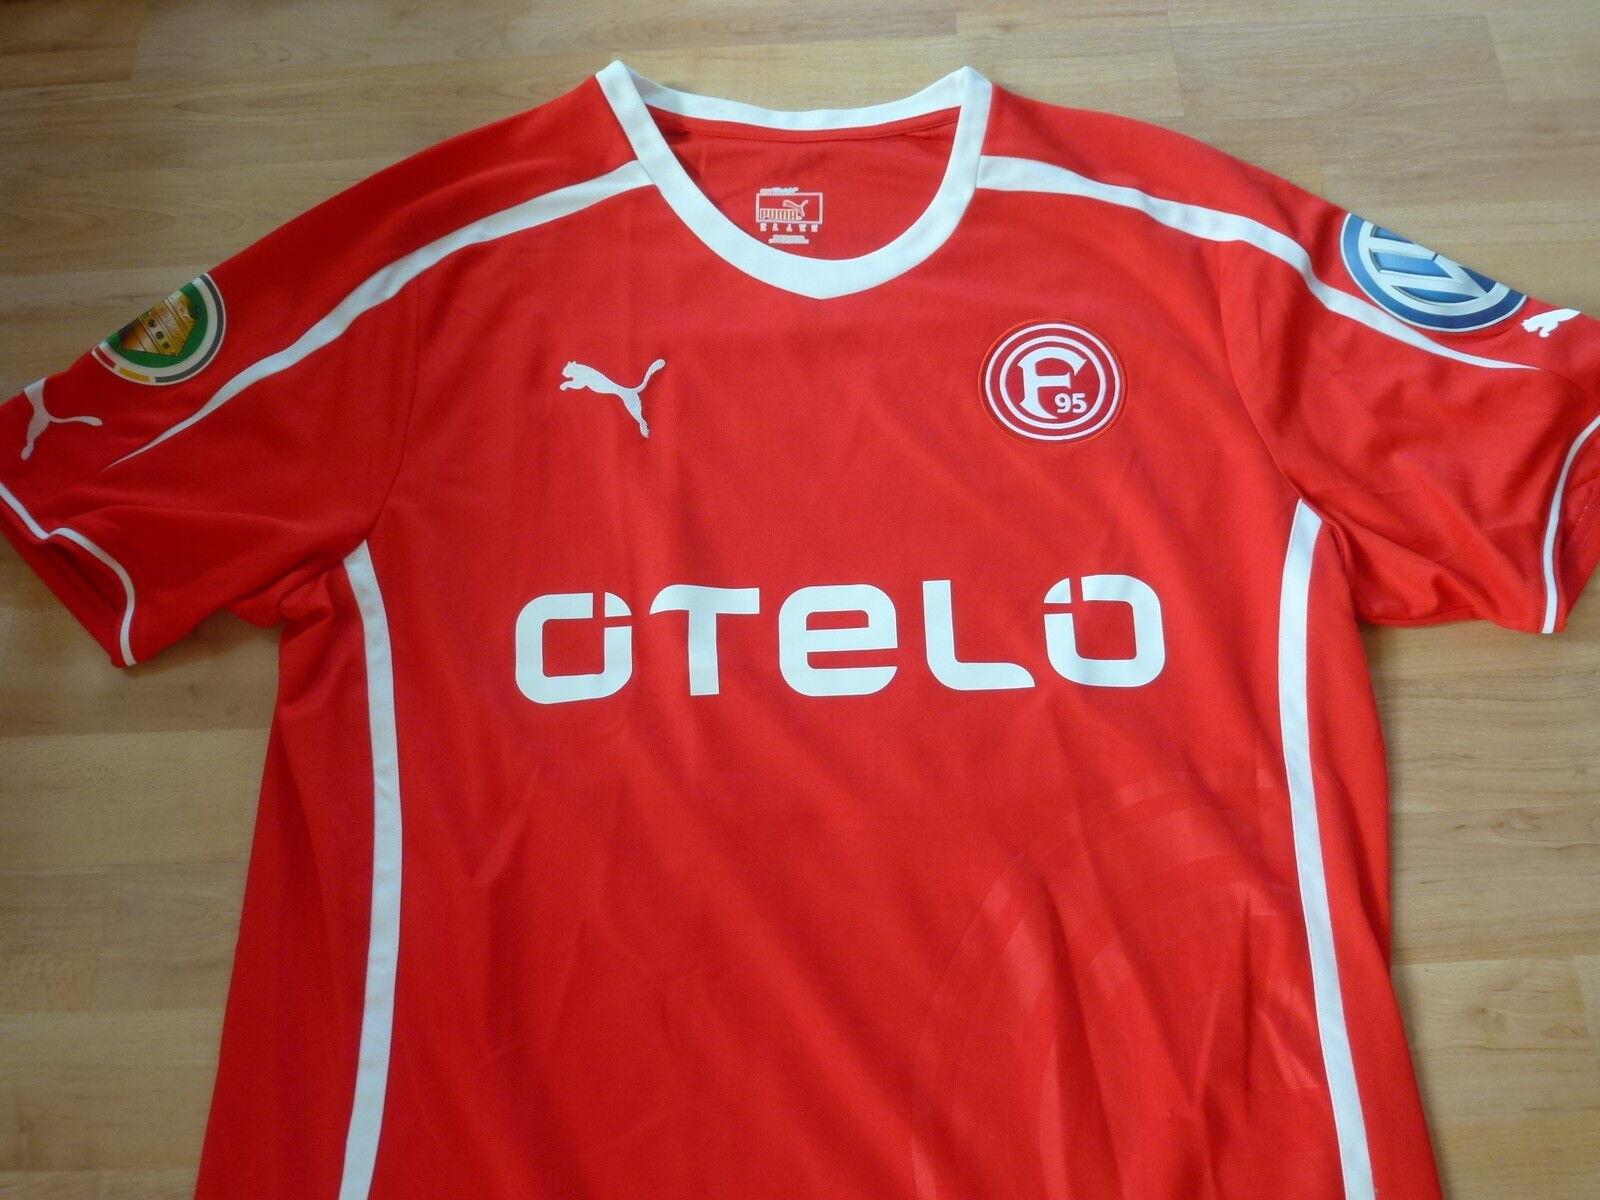 Spieler Trikot Fortuna Düsseldorf  15 Paurevic 2013-14 Pokaltrikot signiert  XL